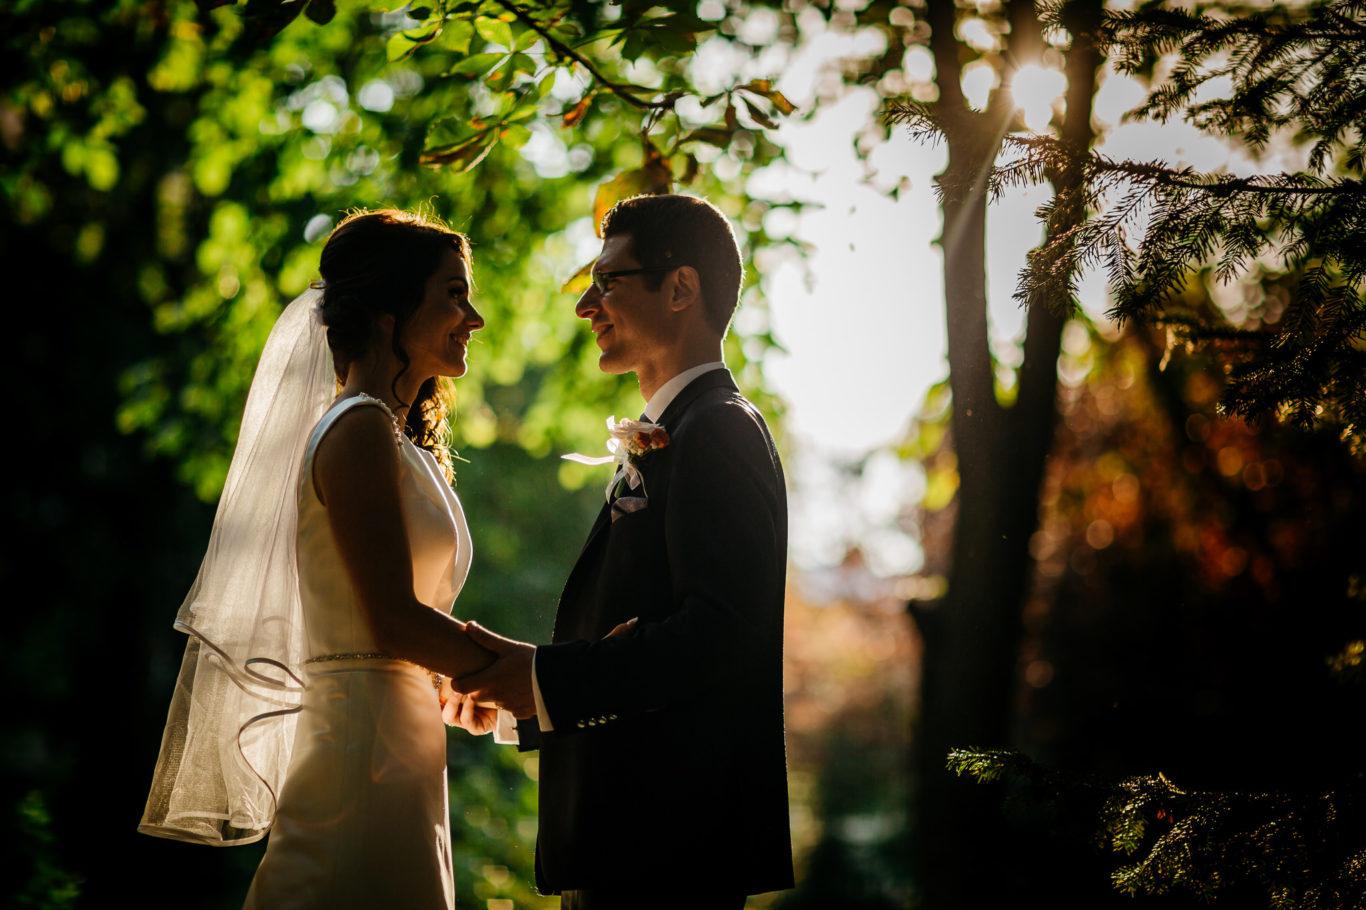 0555-fotografie-nunta-bucuresti-dana-radu-fotograf-ciprian-dumitrescu-cd2_7779